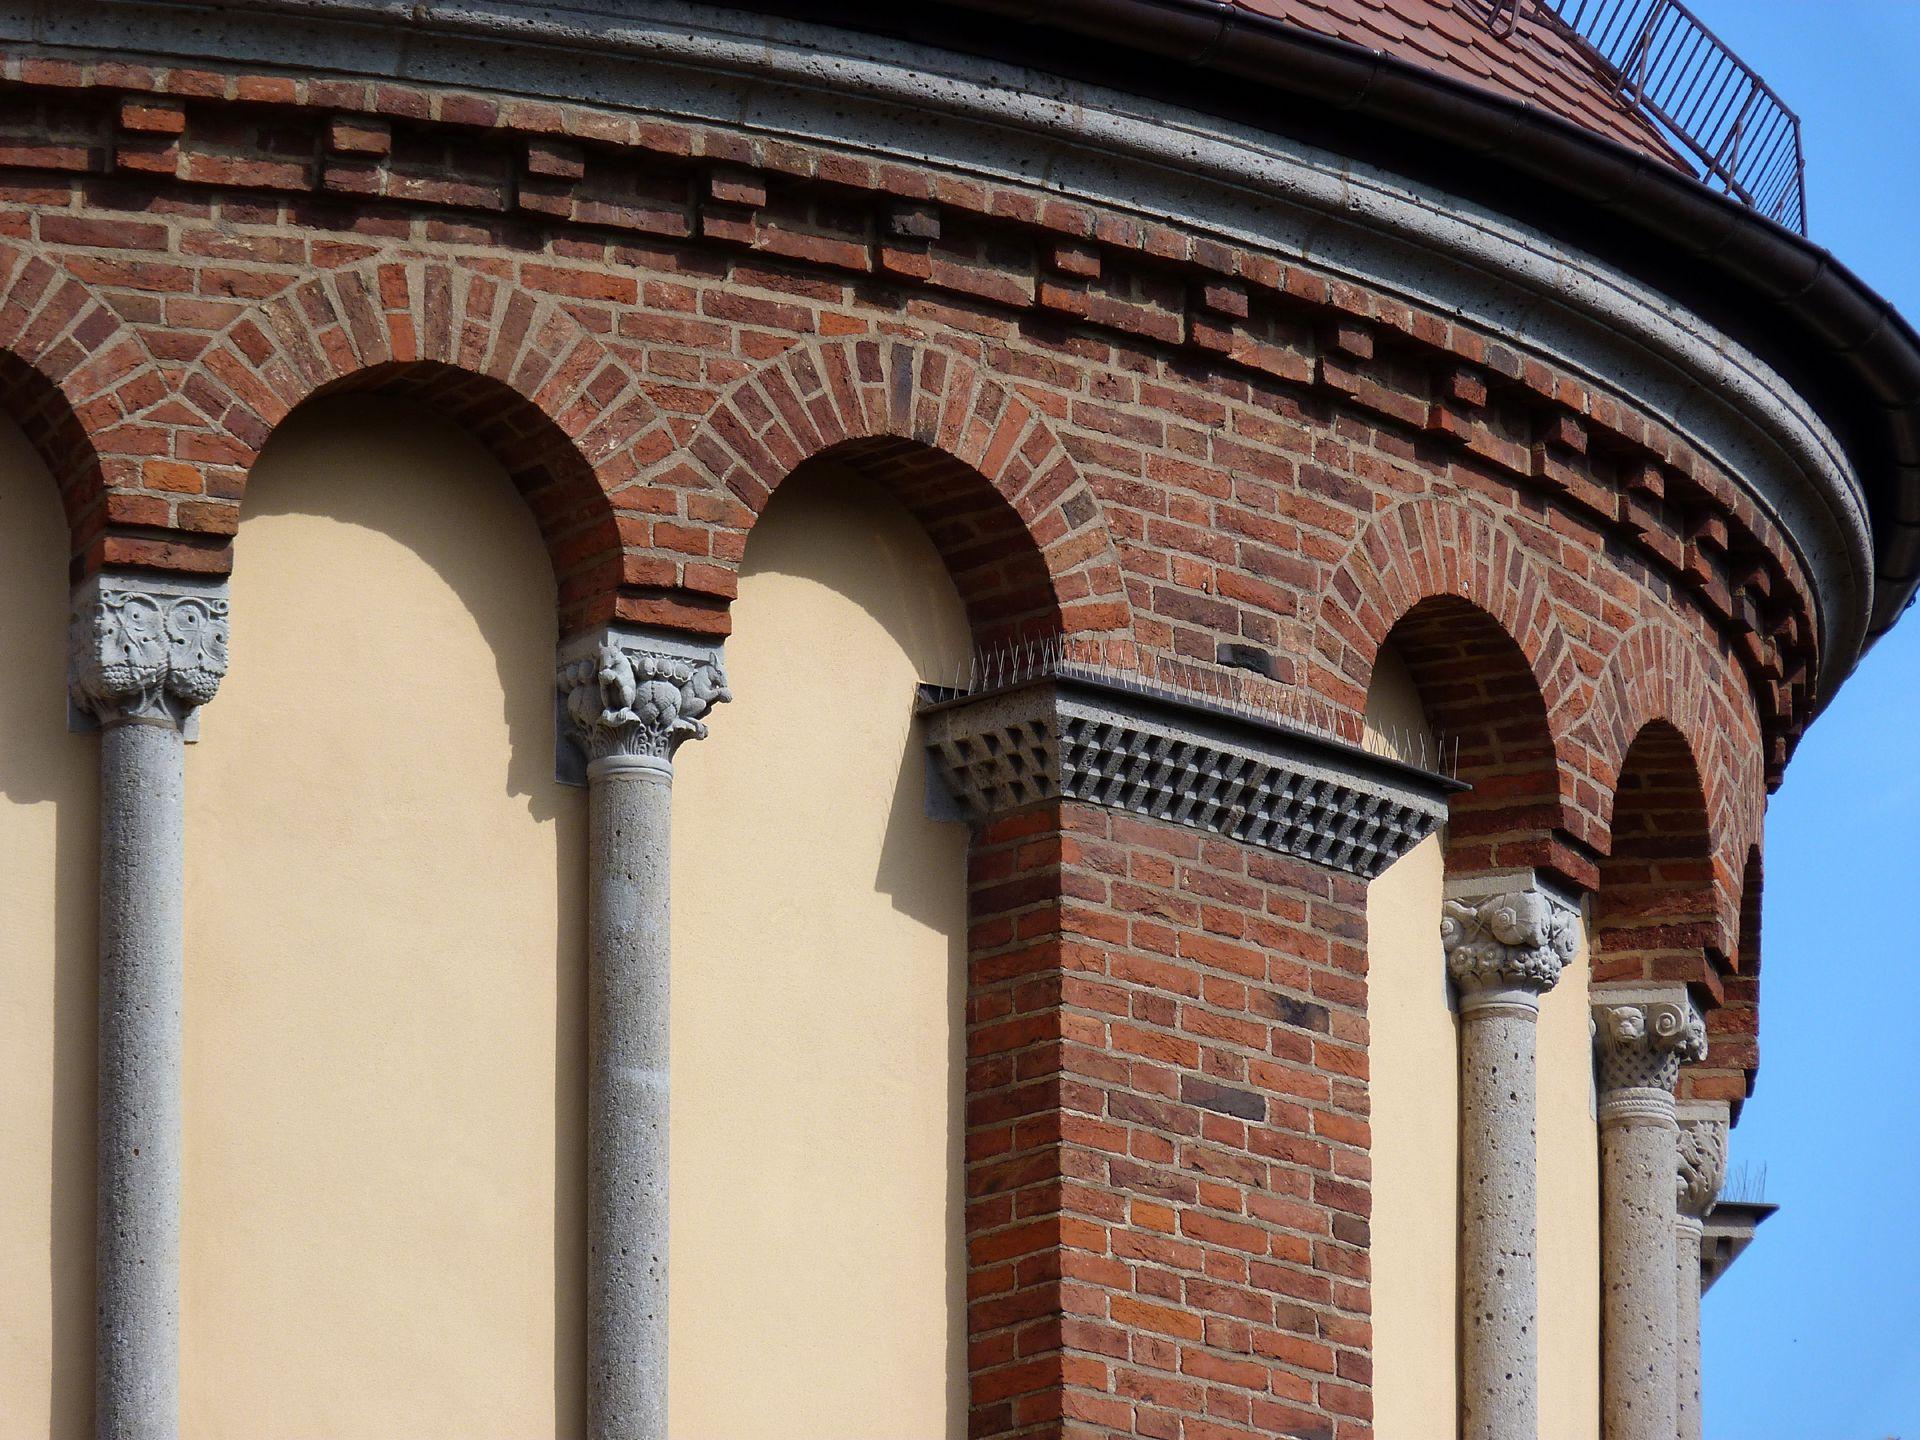 St. Anton Church Apsis, blind arcades